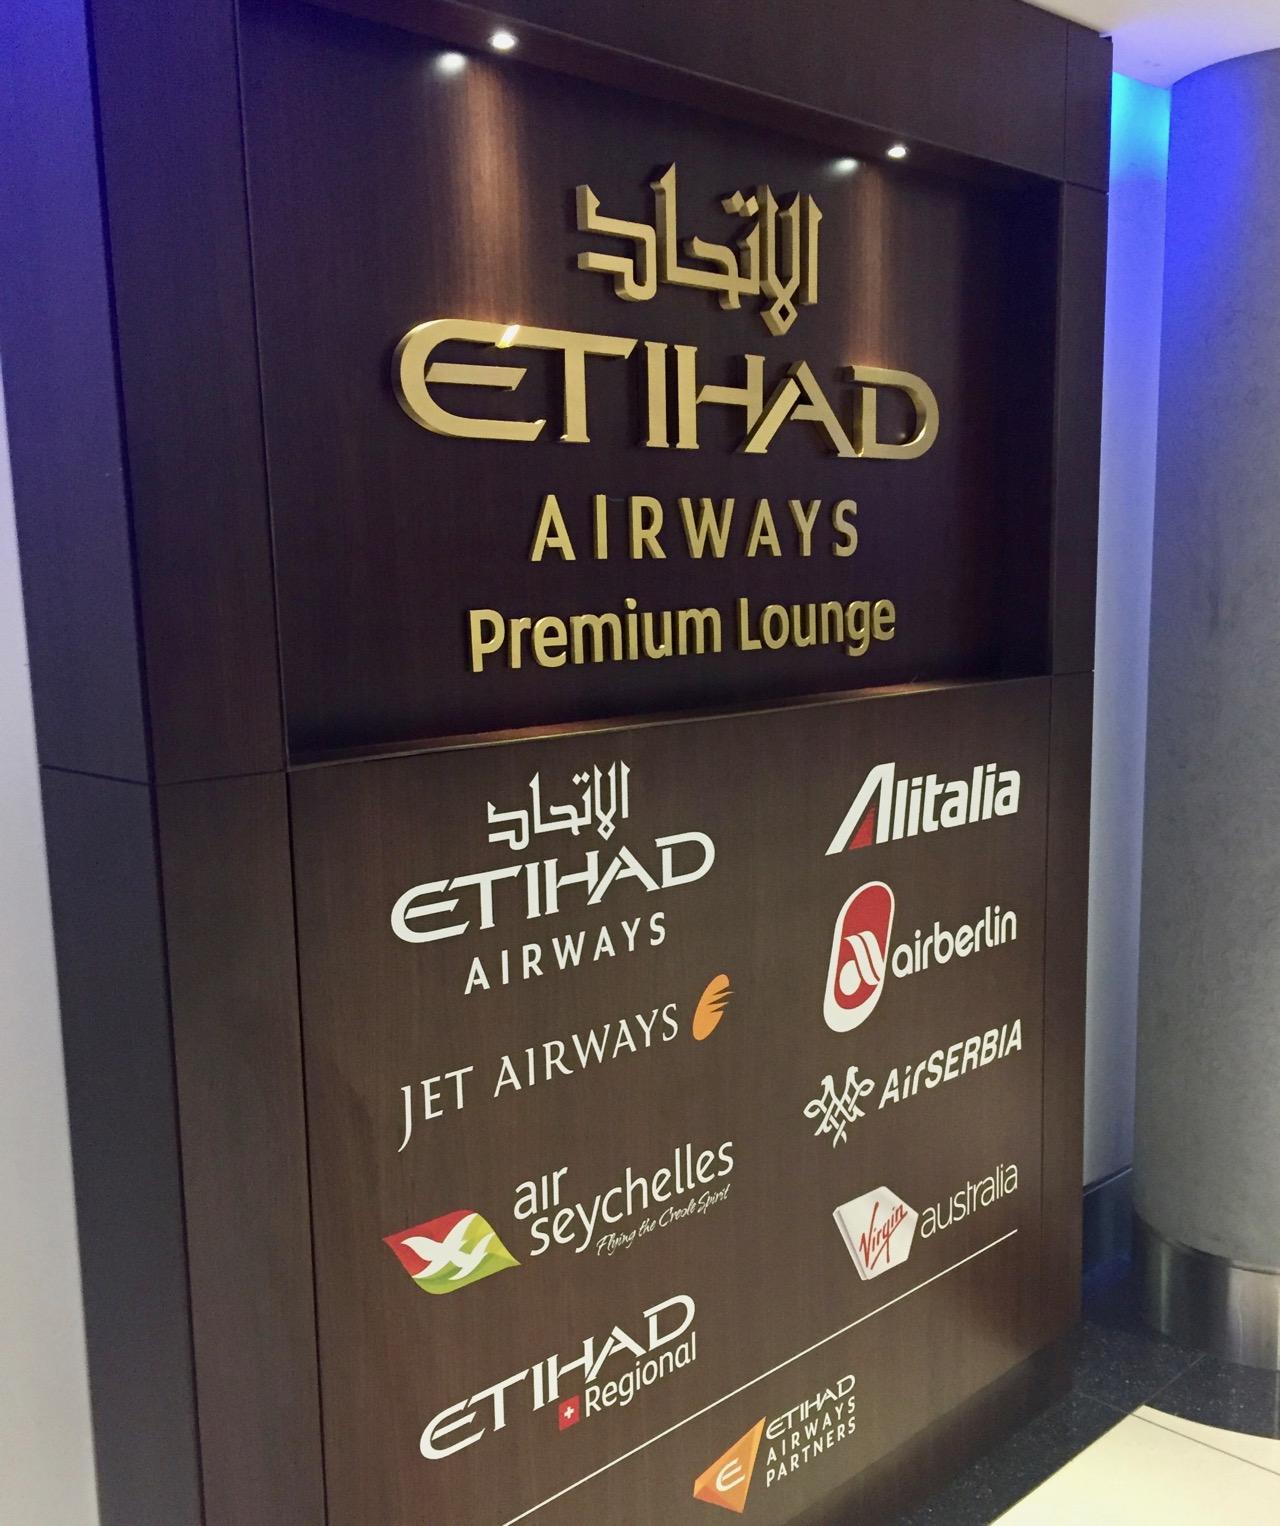 Etihad Premium Lounge Abu Dhabi | Point Hacks